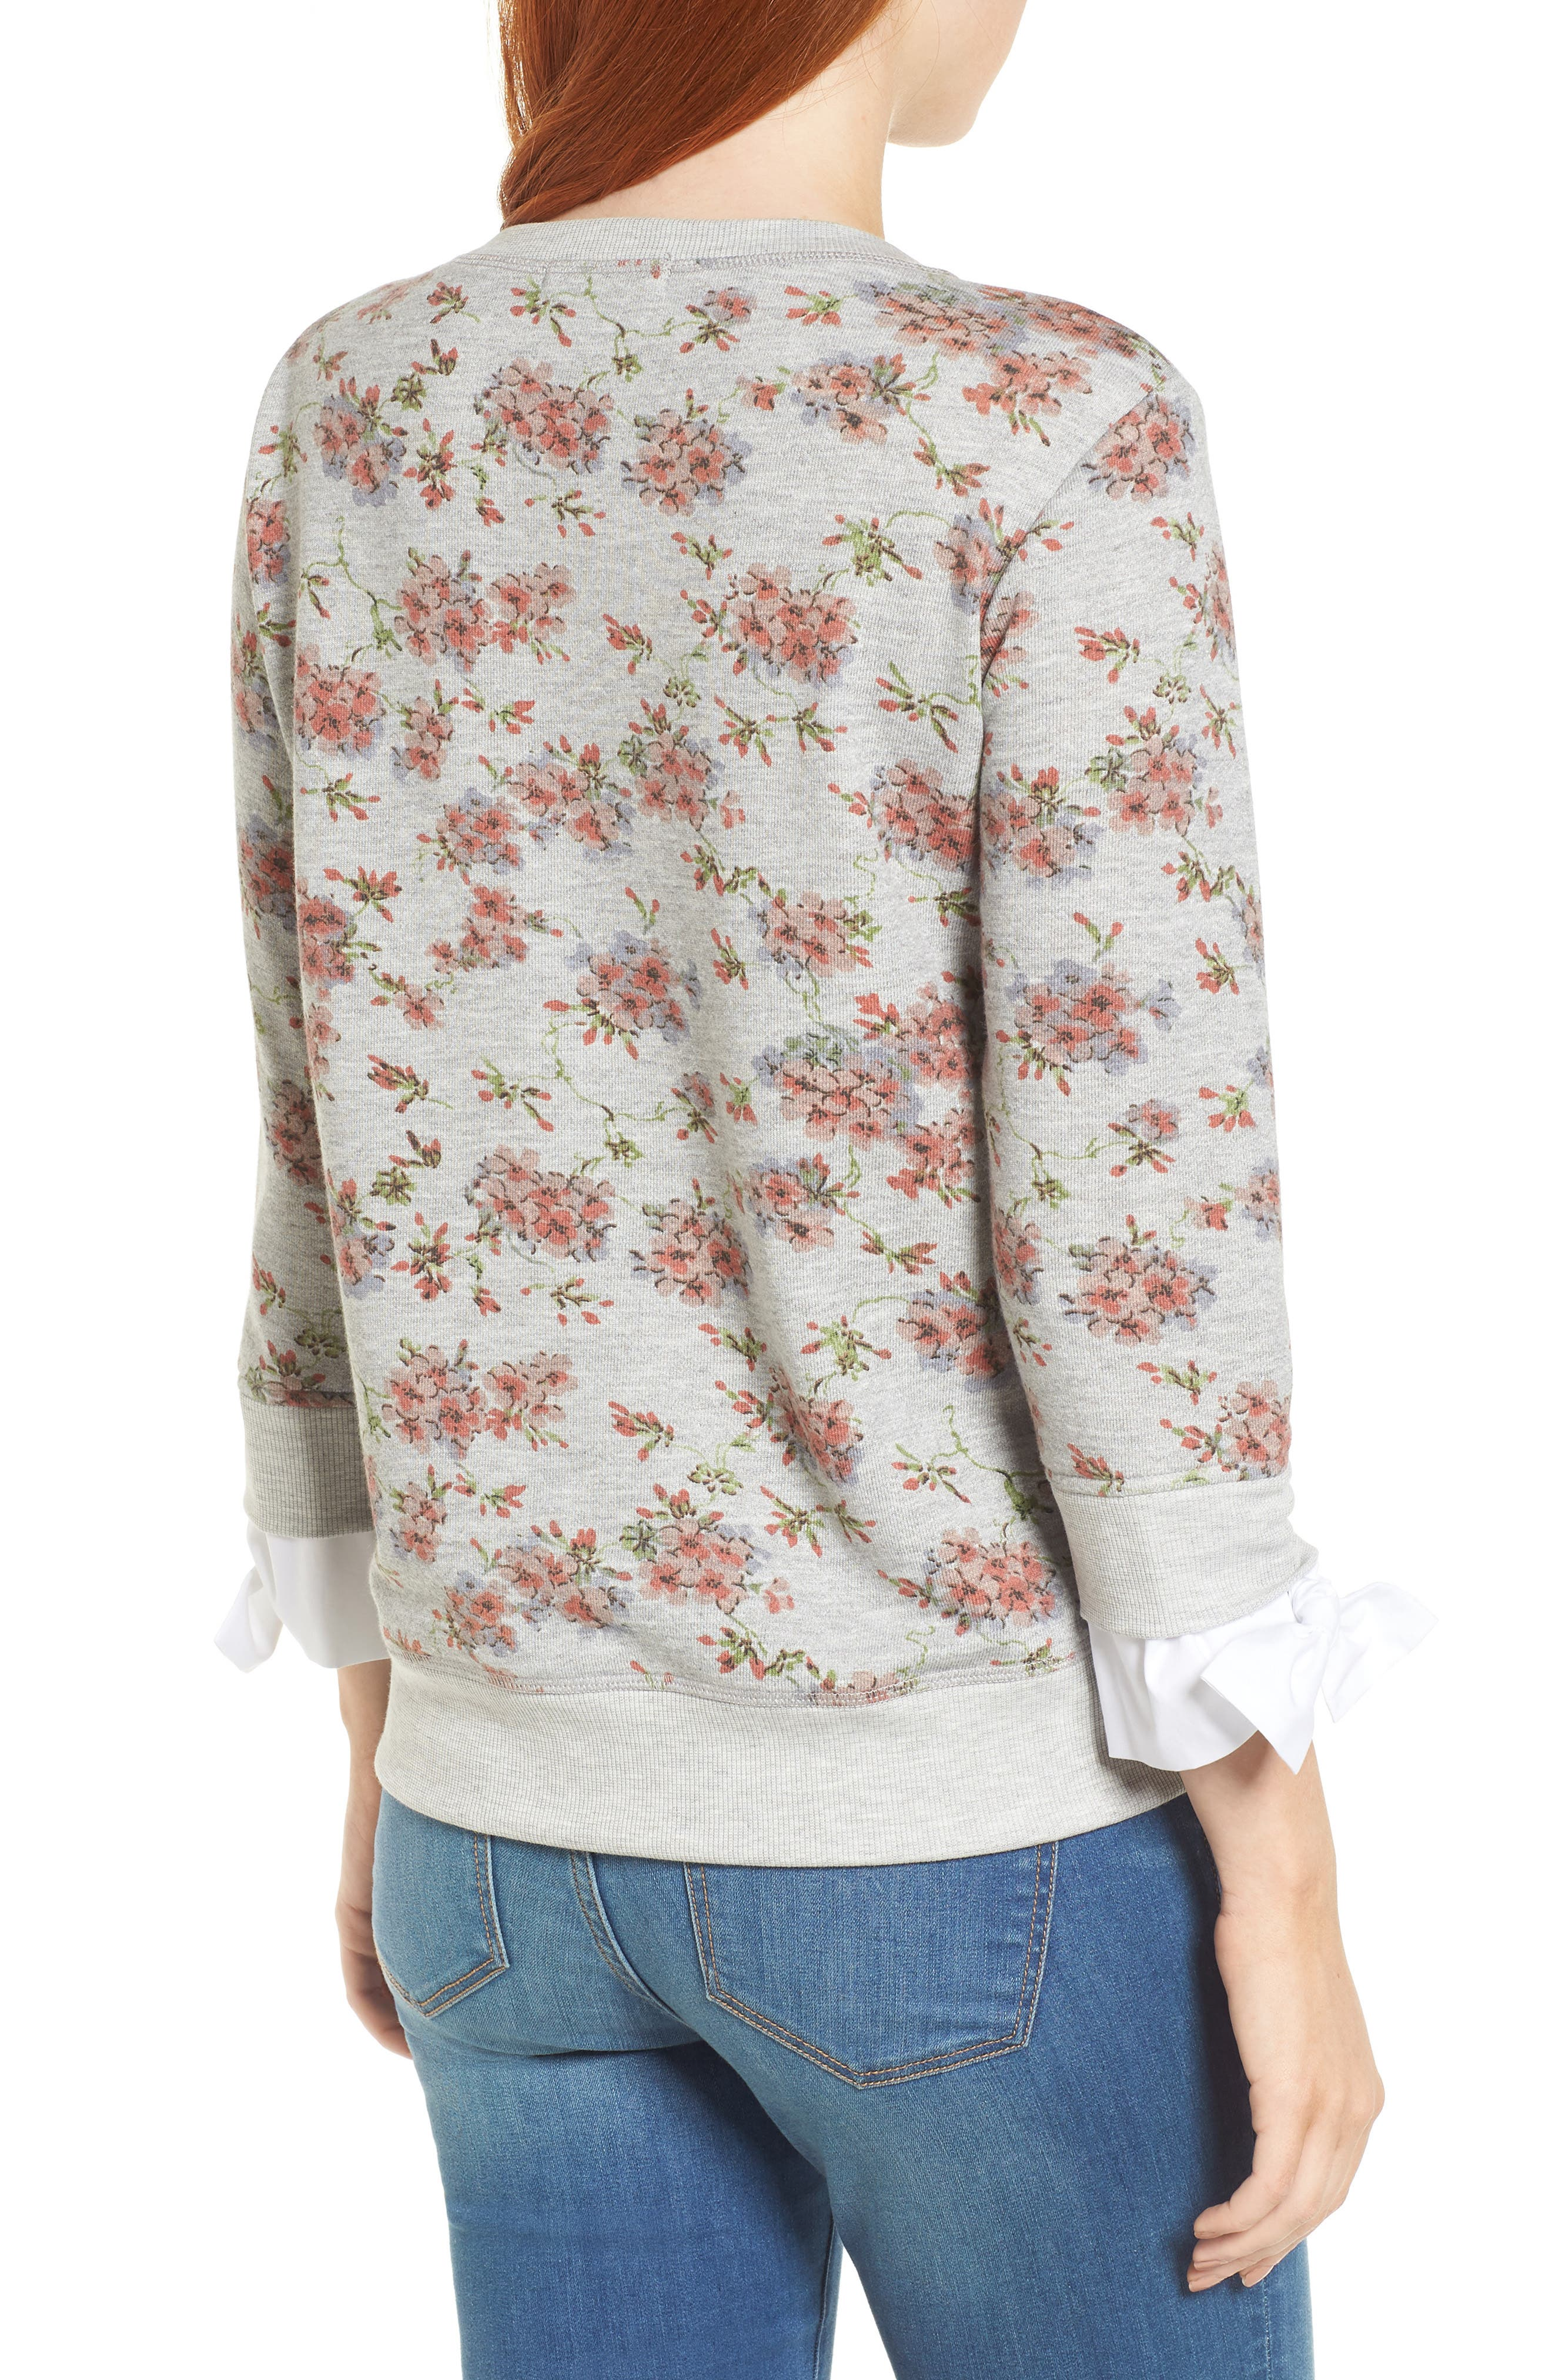 Poplin Cuff Sweatshirt,                             Alternate thumbnail 2, color,                             Grey Blush Floral W/ White